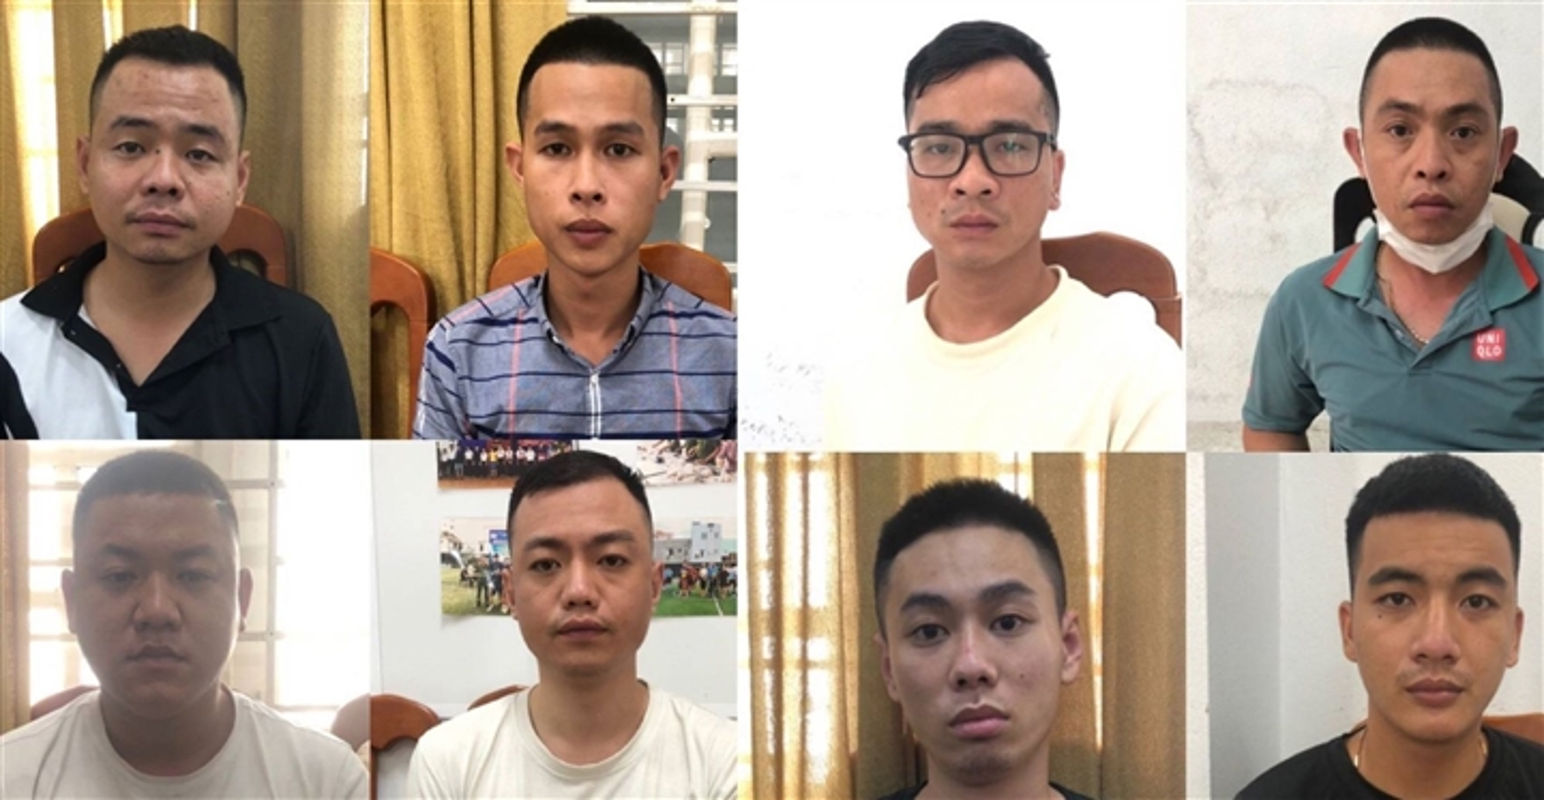 Tin nong 10/6: Bop co nan nhan de hiep dam roi phi tang xac-Hinh-7